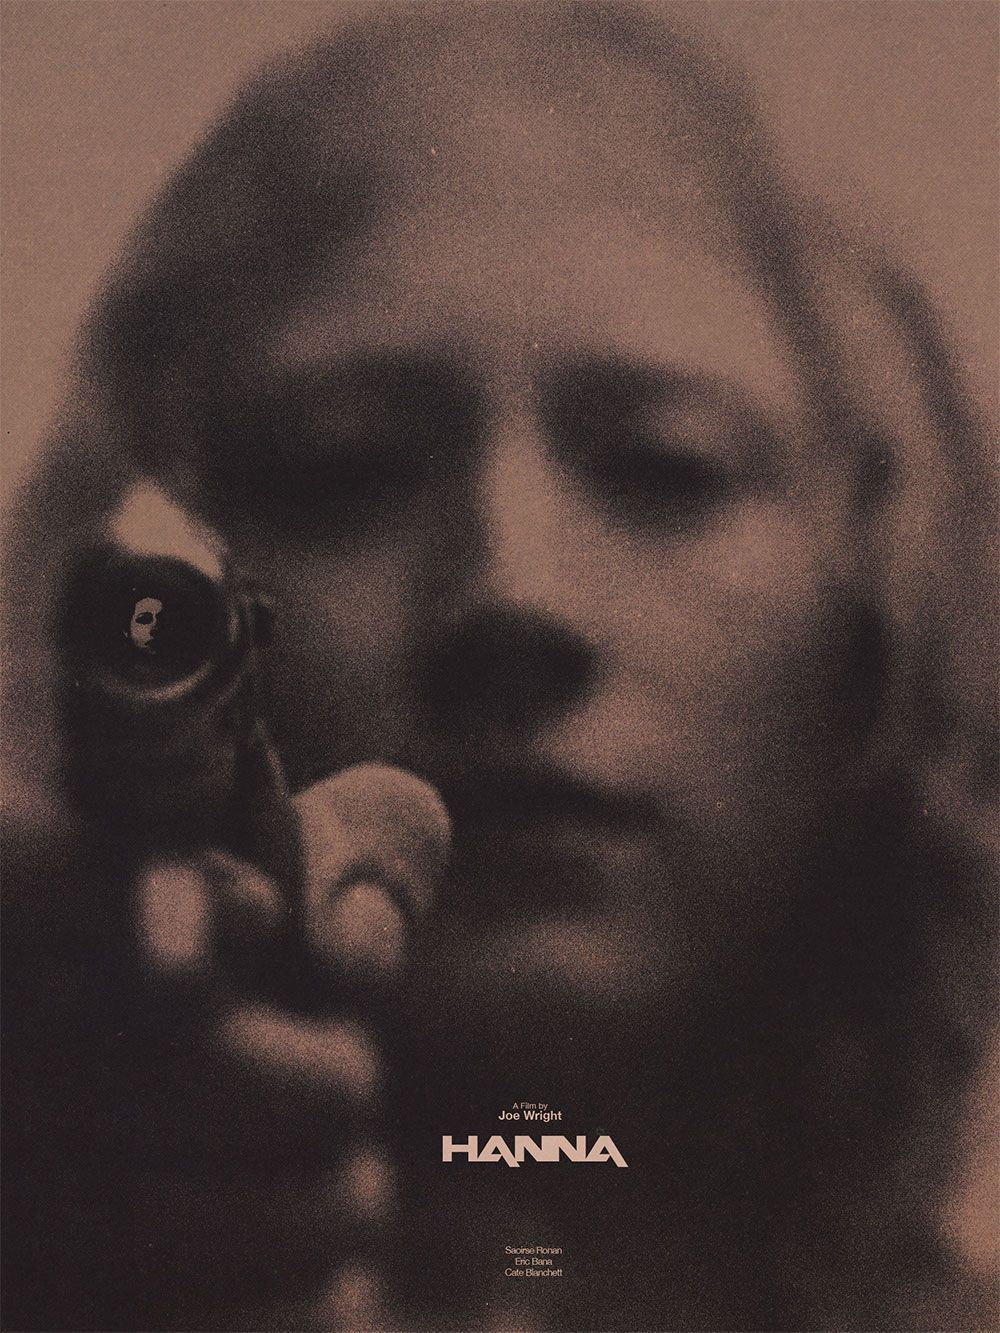 Joe Wright;Hanna; Film Poster #filmposterdesign Joe Wright;Hanna; Film Poster #filmposterdesign